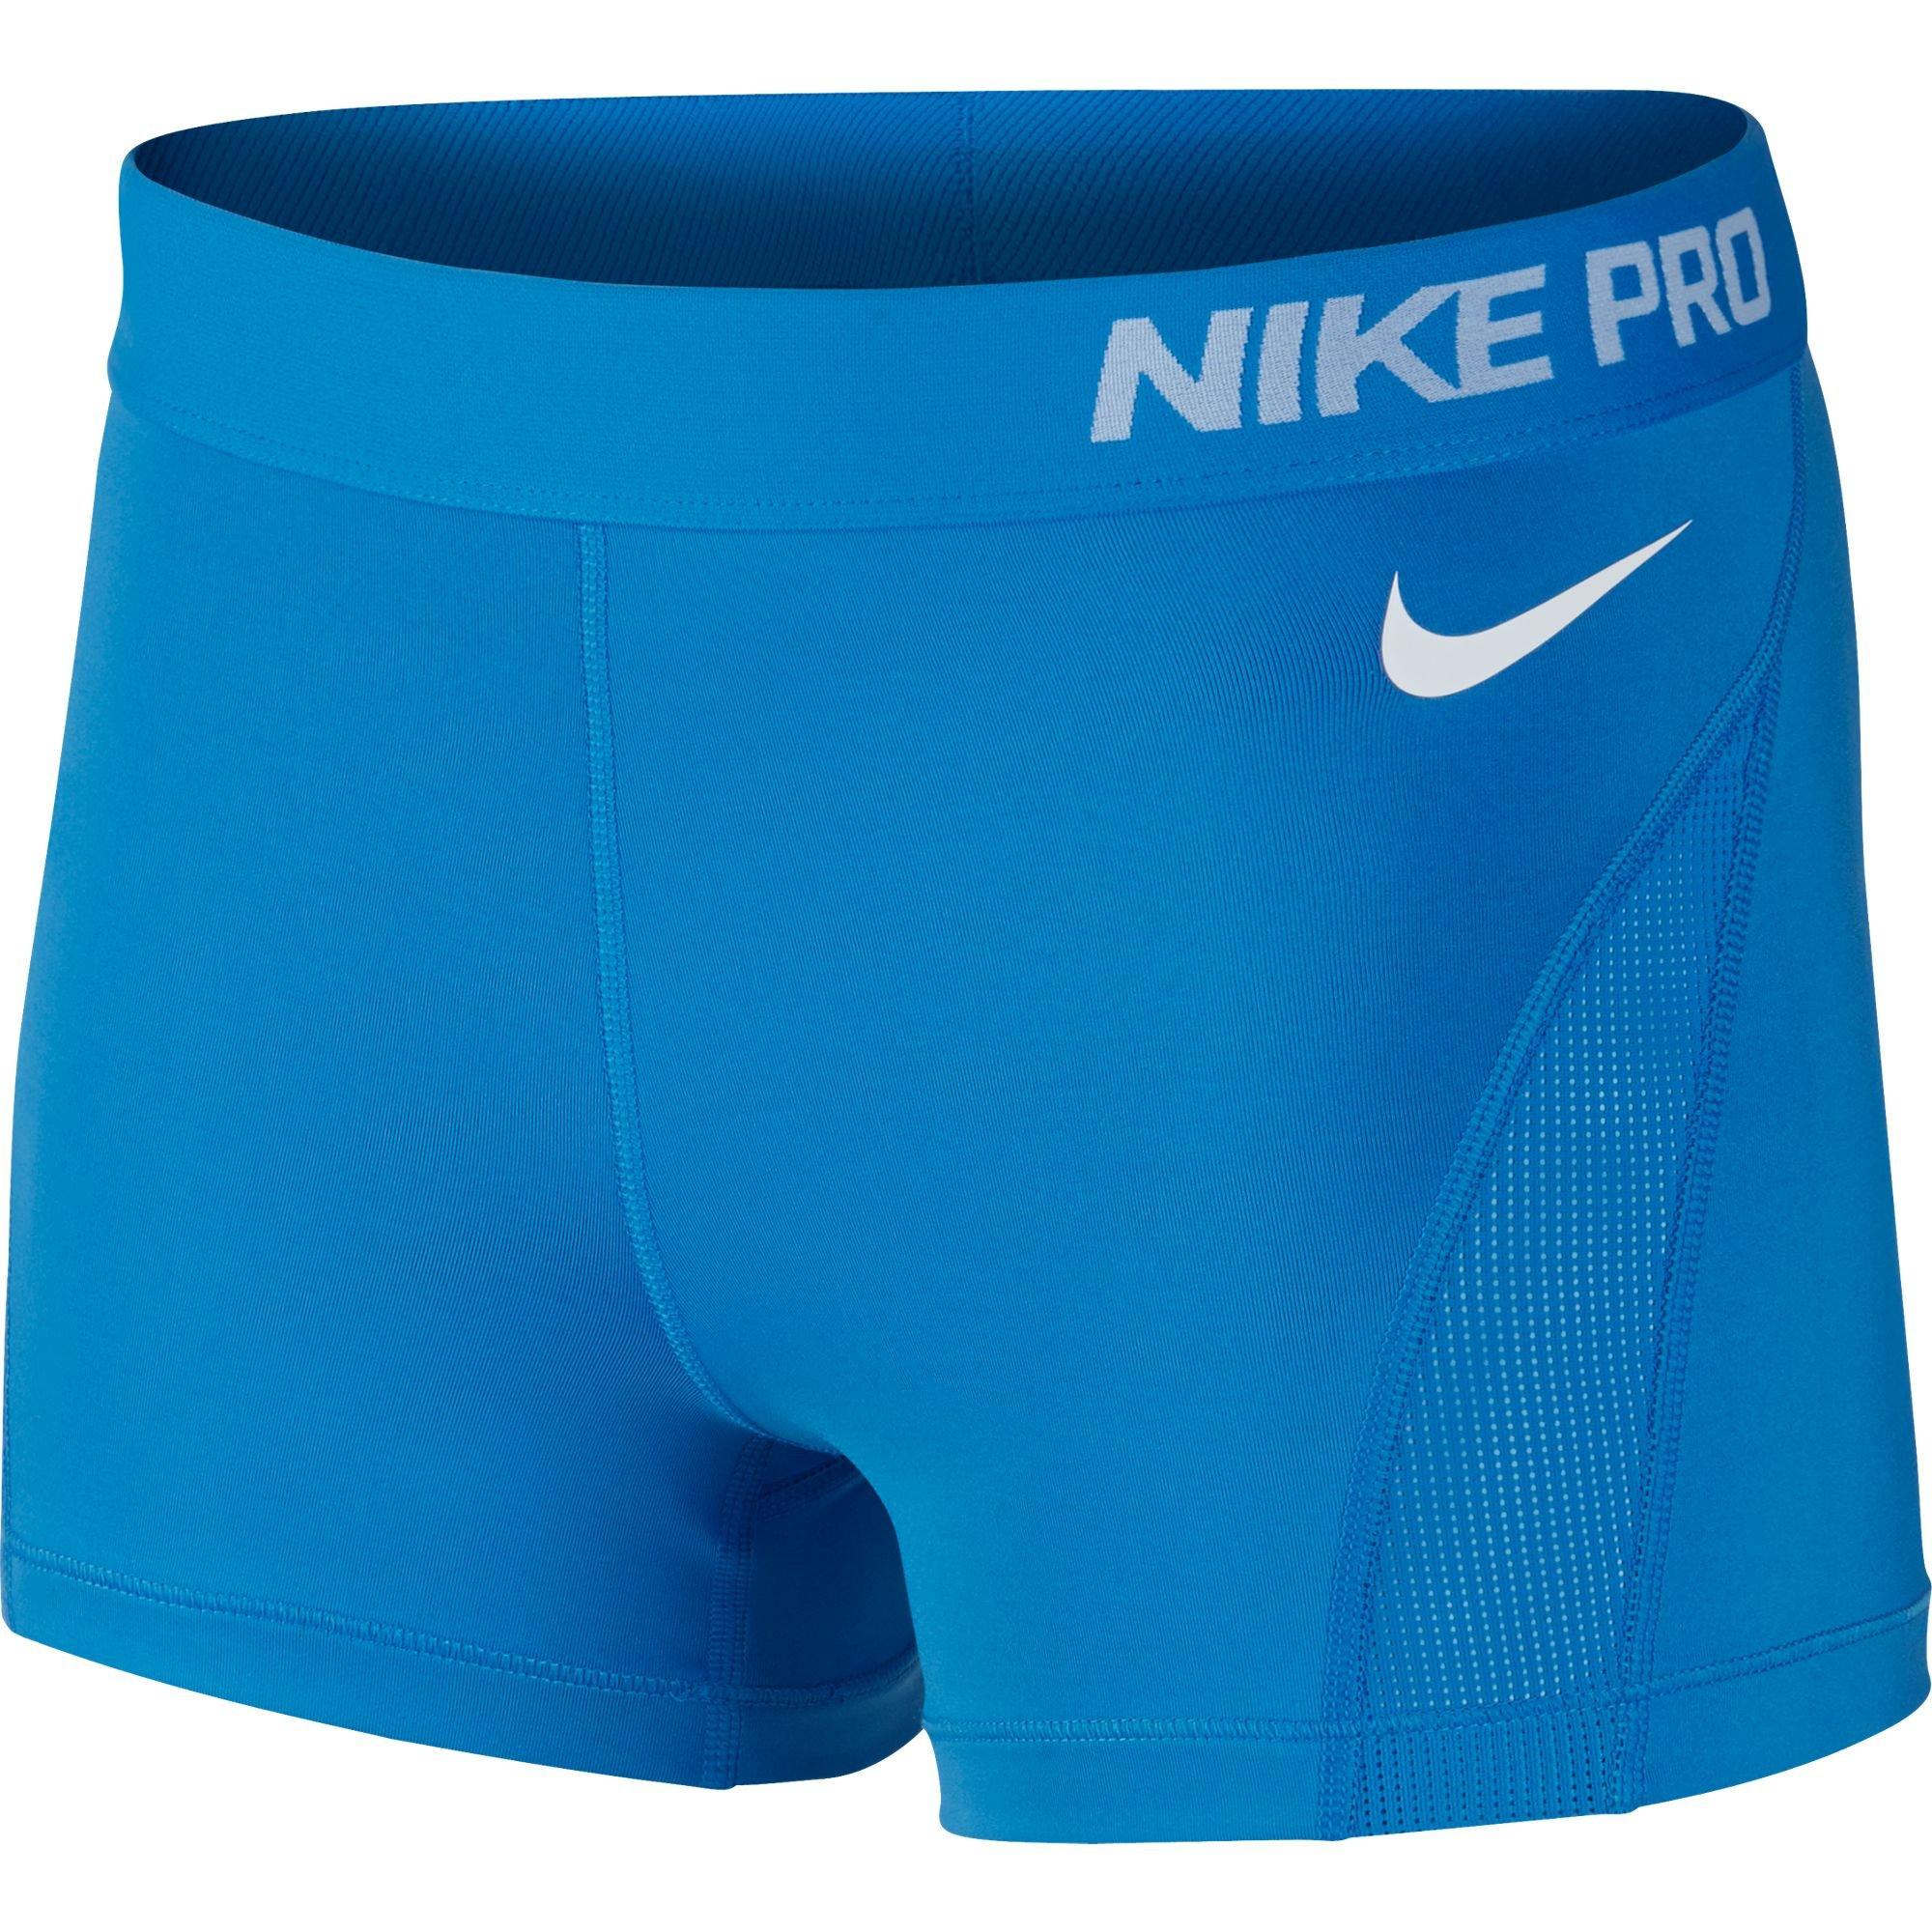 Nike Nike Pro Hyper cool 3Short–Lt Photo Blue/White, multicolore, XL